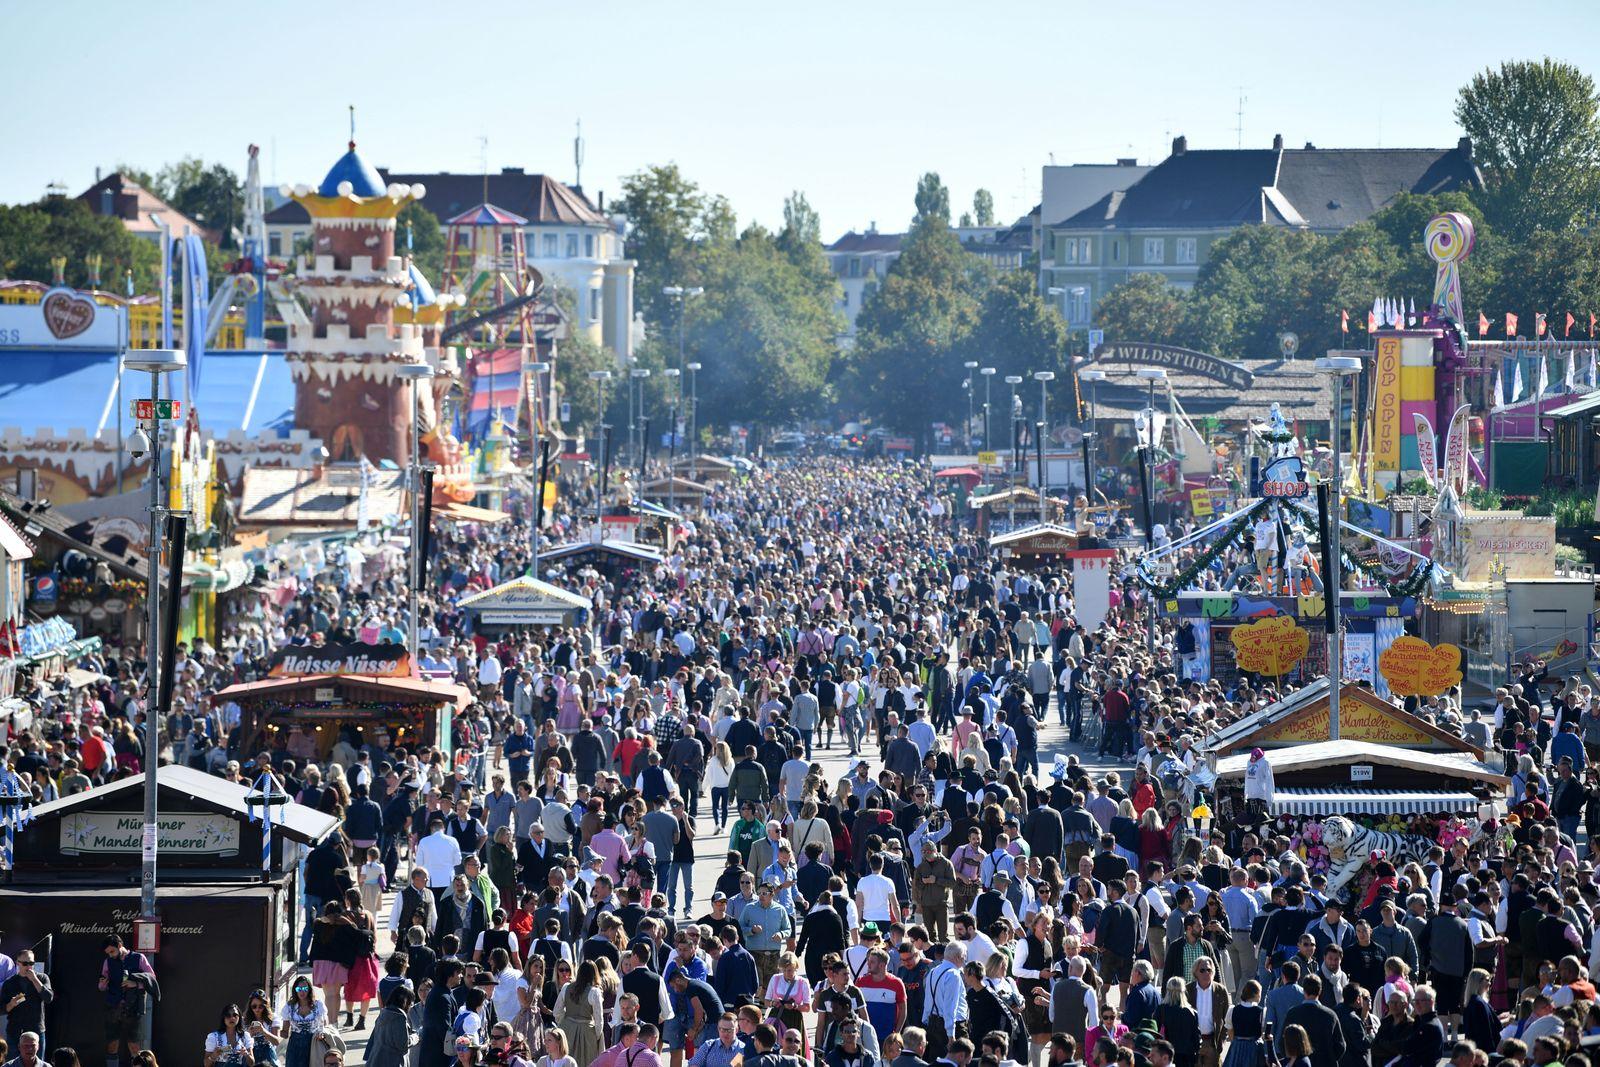 Germany's Oktoberfest cancelled amid coronavirus pandemic, Munich - 21 Sep 2019